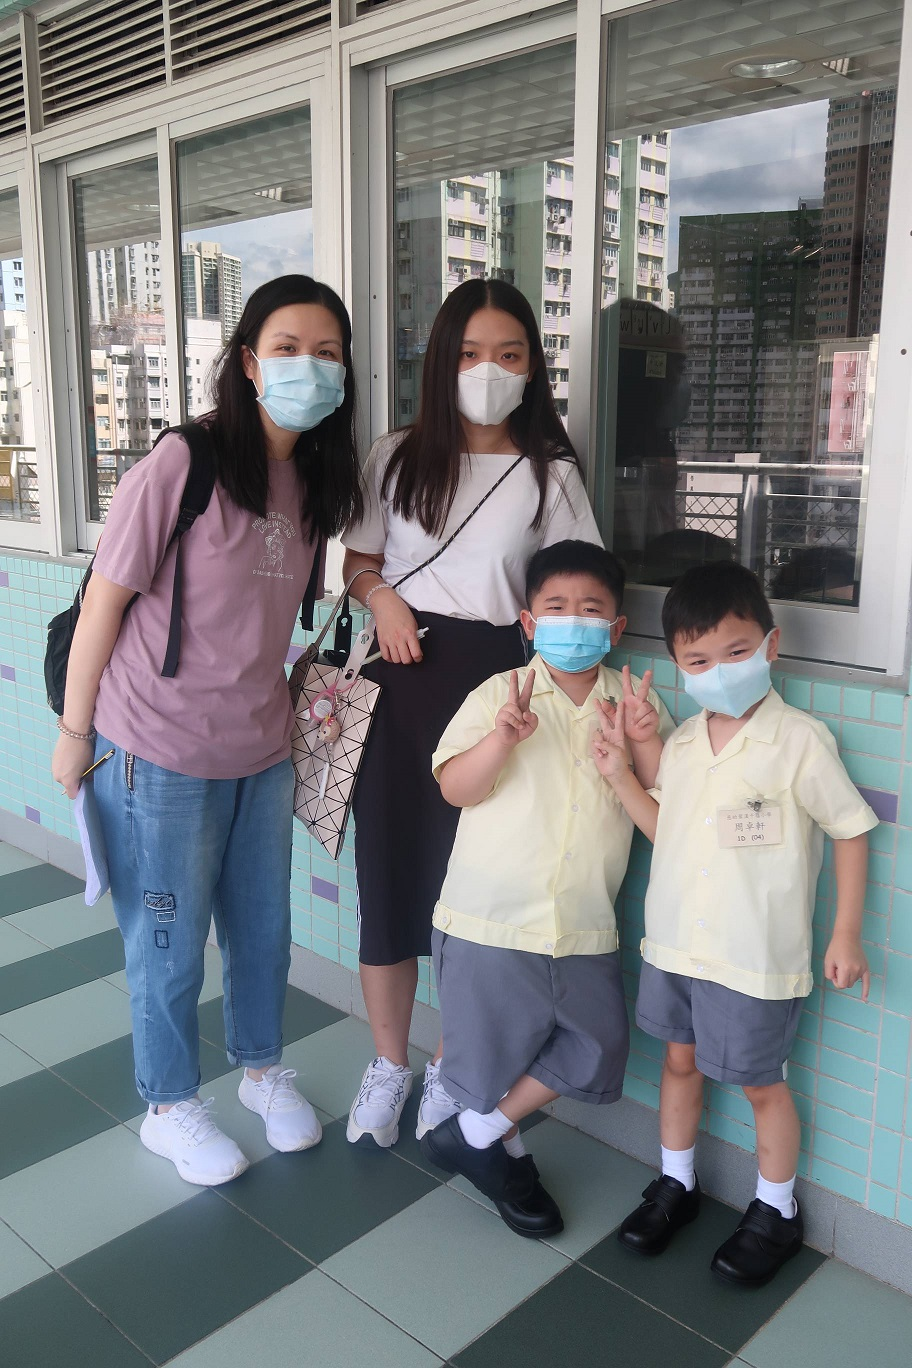 https://syh.edu.hk/sites/default/files/img_6687_1.jpg